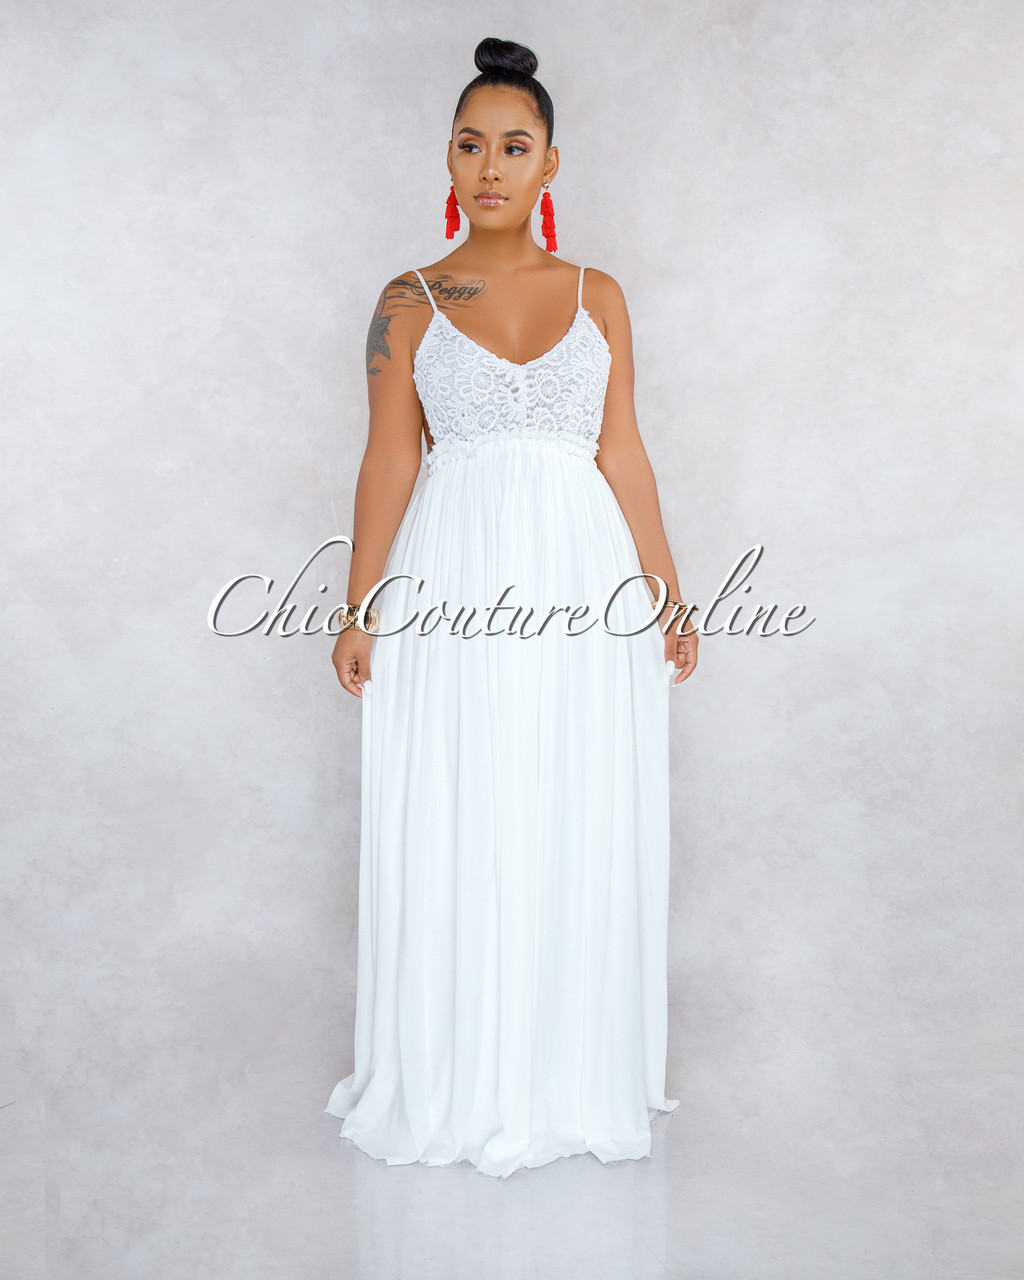 e14ff52a1d69 Rubio Off-White Crochet Top Open Back Maxi Dress. Price: $50.00. Image 1